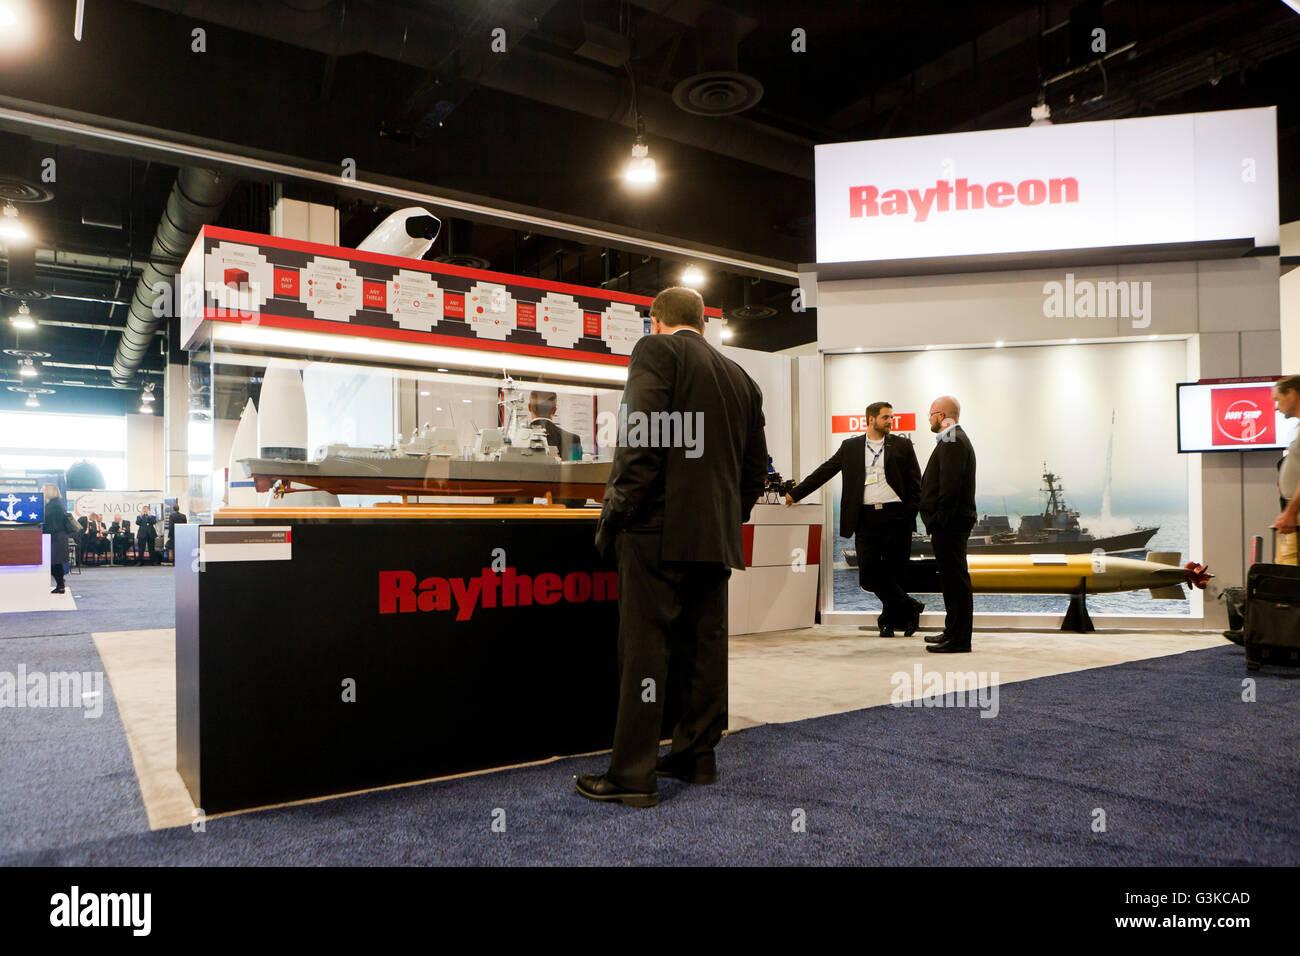 Raytheon exhibit booth at US Navy League Sea-Air-Space Exposition - Washington, DC USA - Stock Image